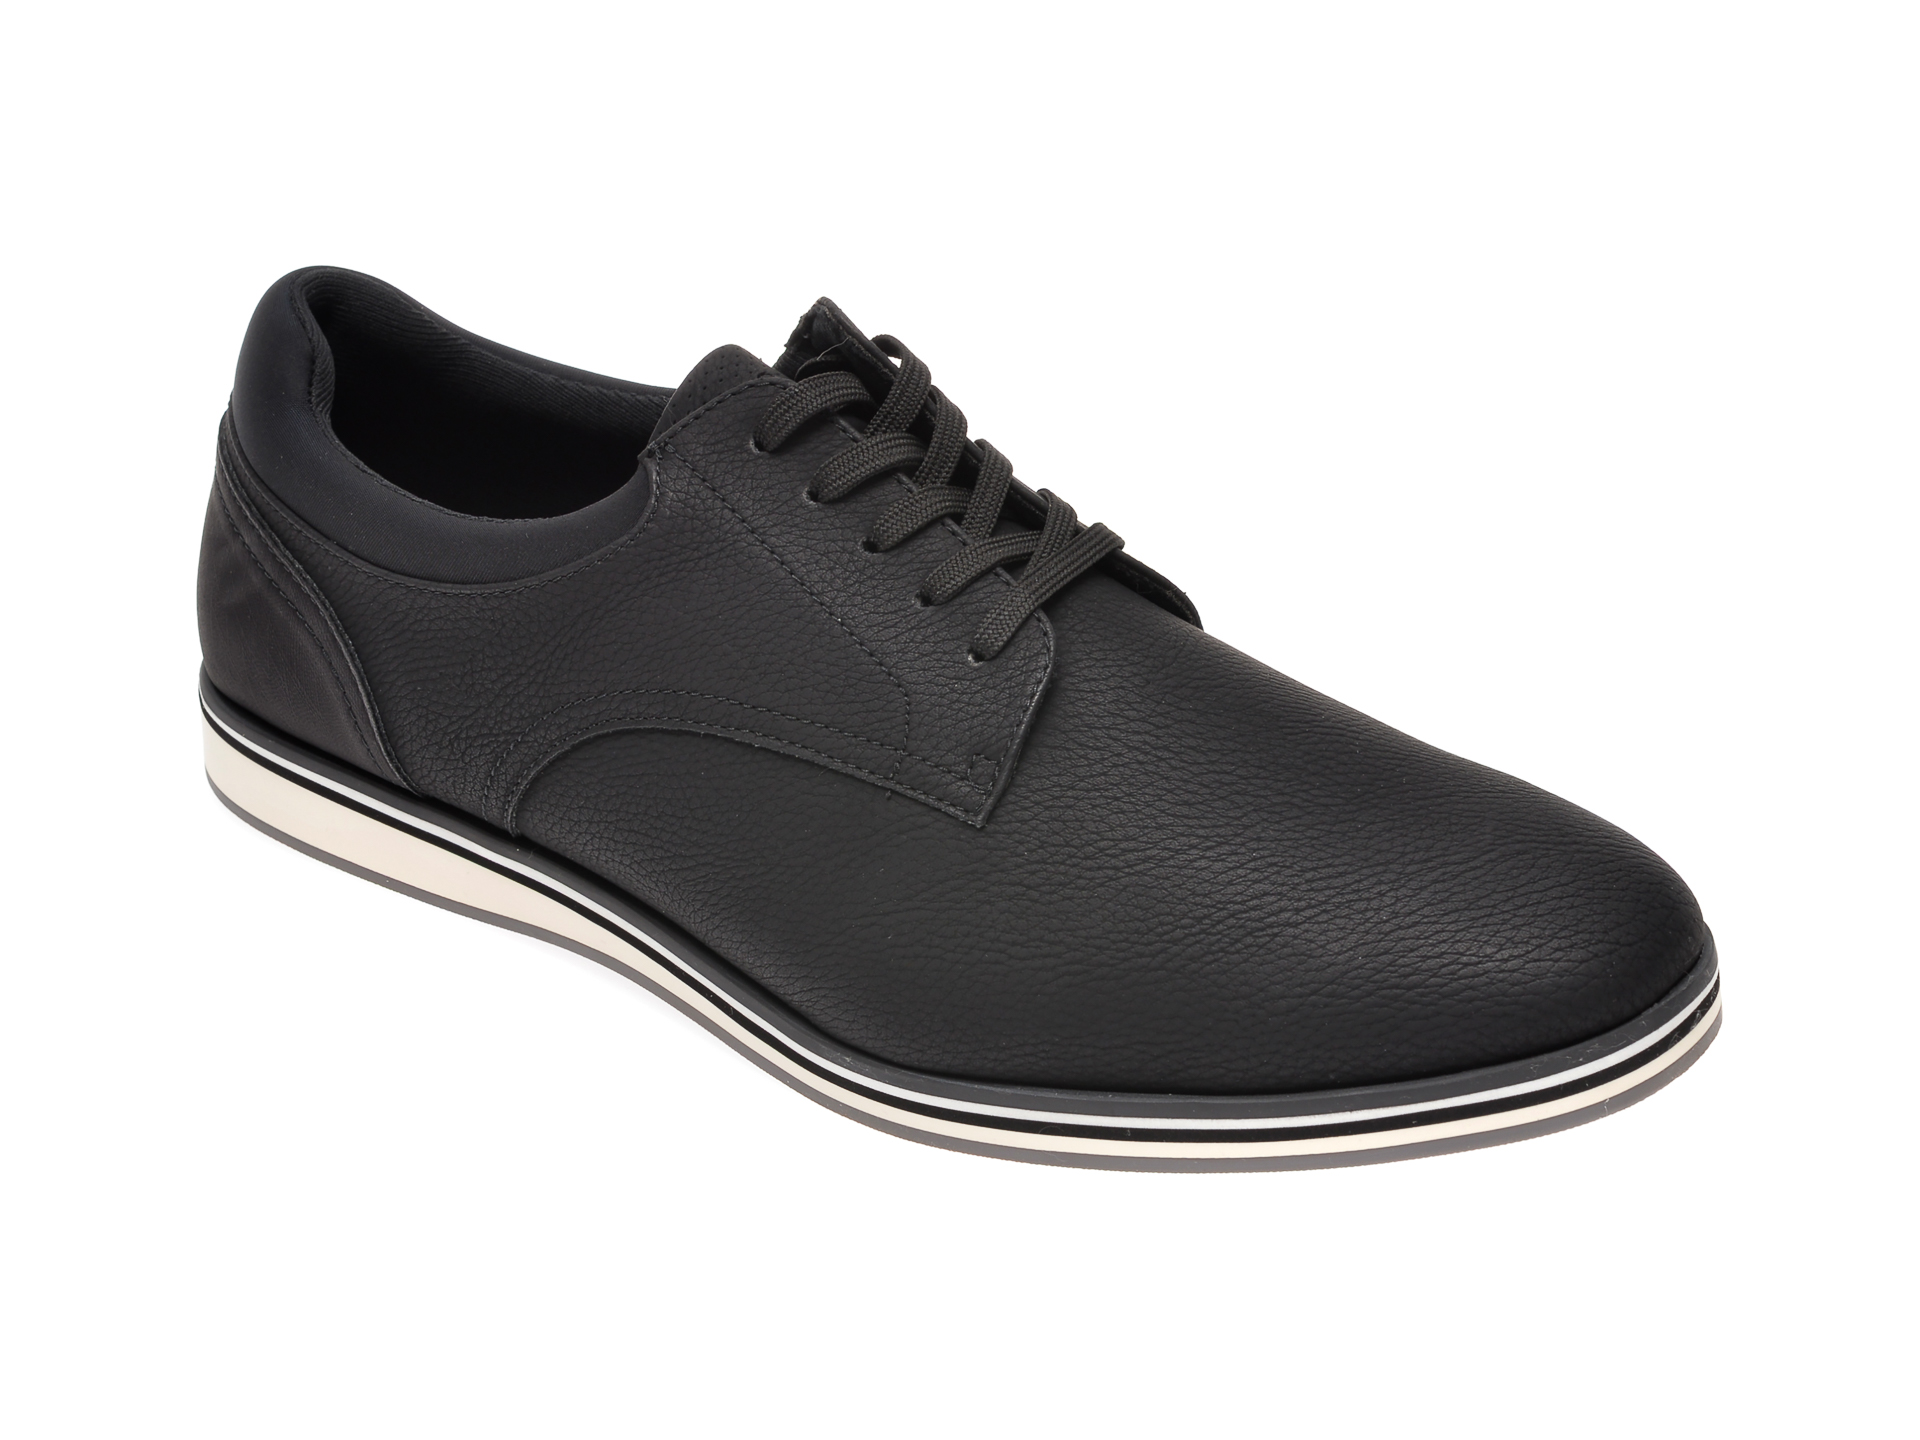 Pantofi Aldo Negri, Cycia001, Din Piele Ecologica